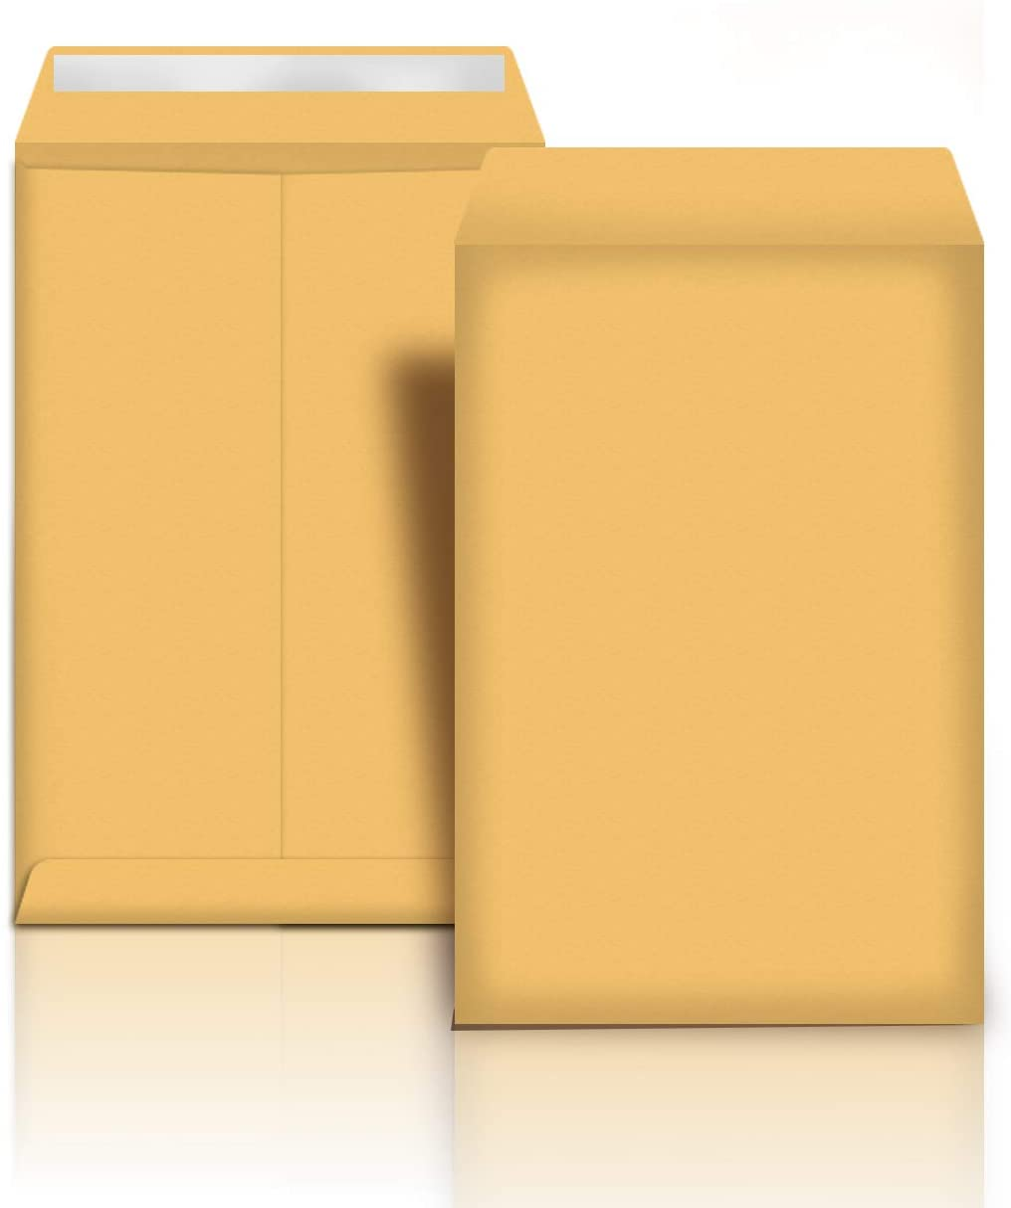 AmazonBasics Catalog Mailing Envelopes, Peel & Seal, 9x12 Inch, Brown Kraft, 250-Pack - AMZA31